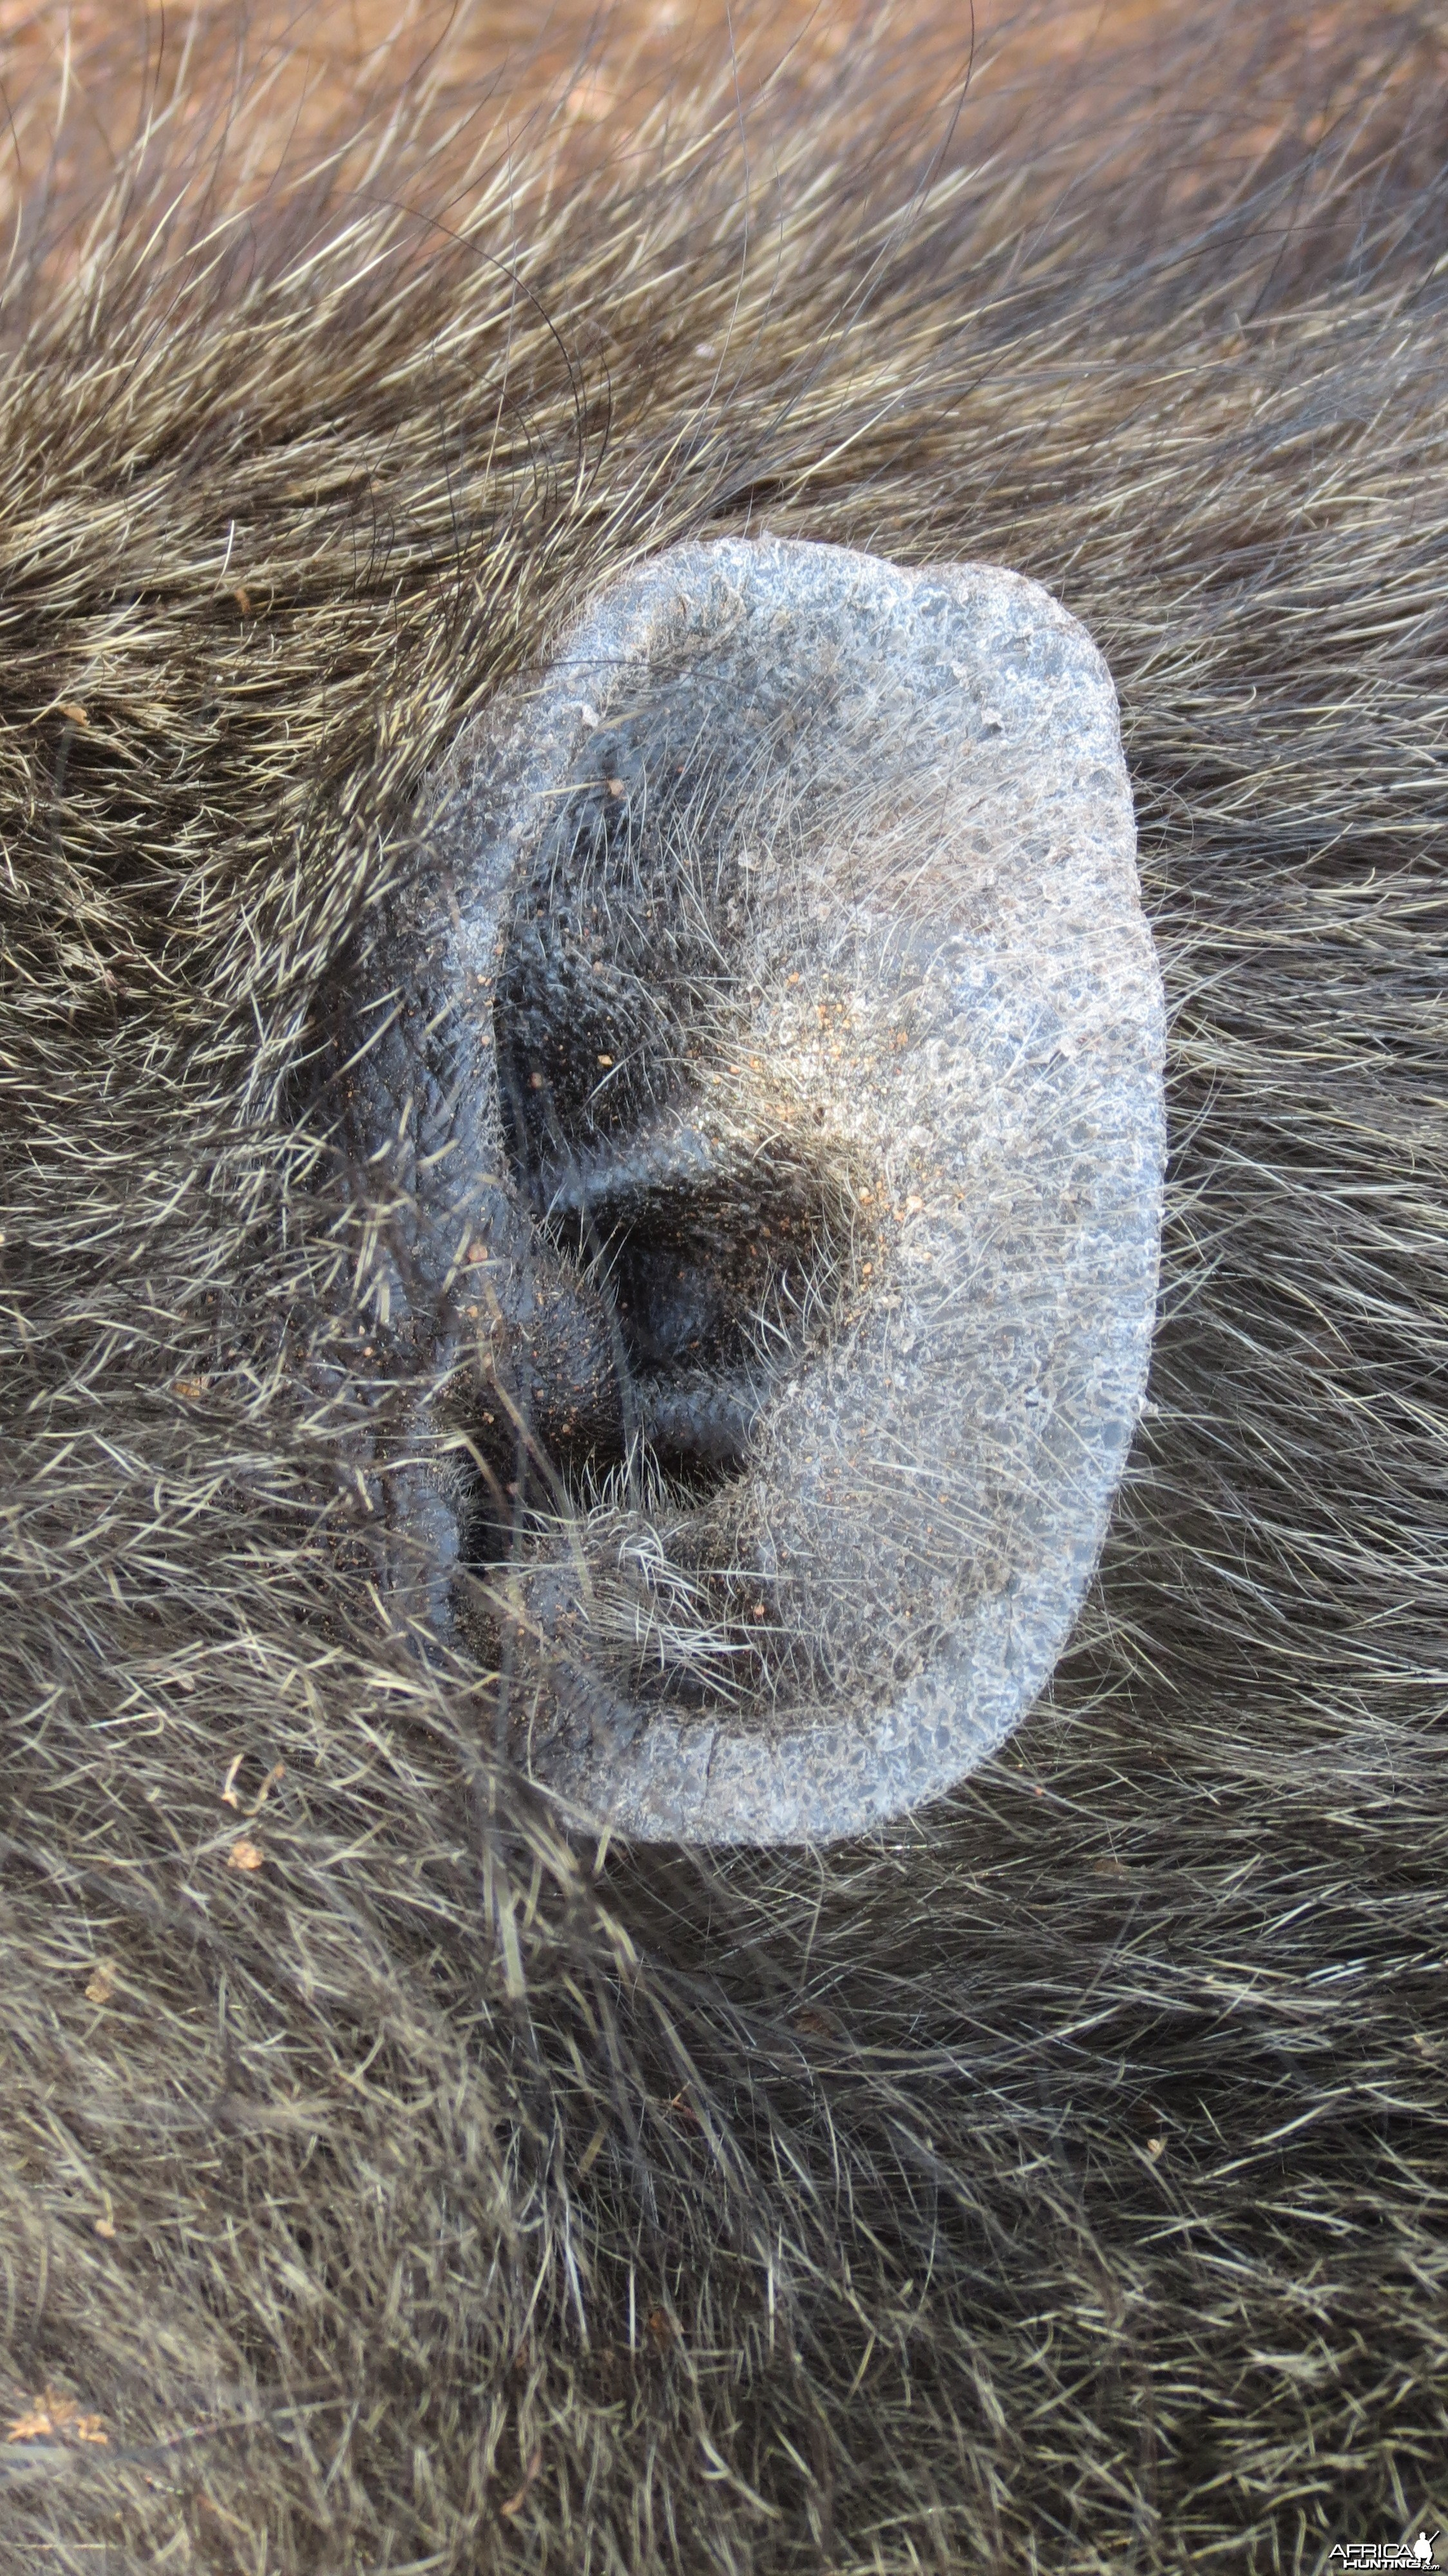 Chacma Baboon ear